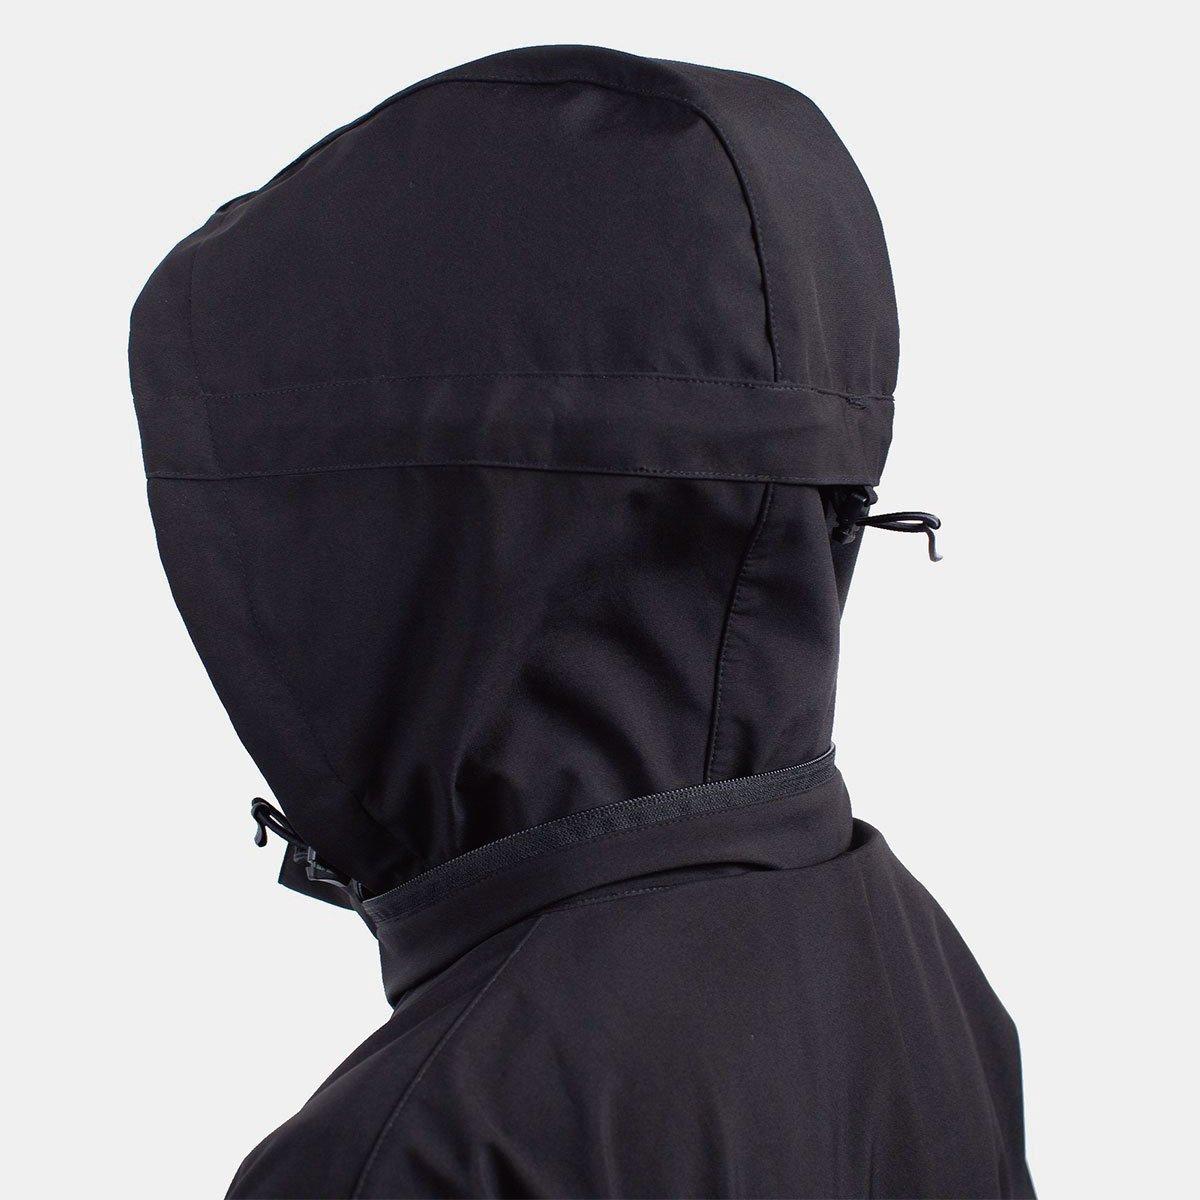 Techwear-Kin-Supplies-Ares-Shell-Jacket-Details-6.jpg